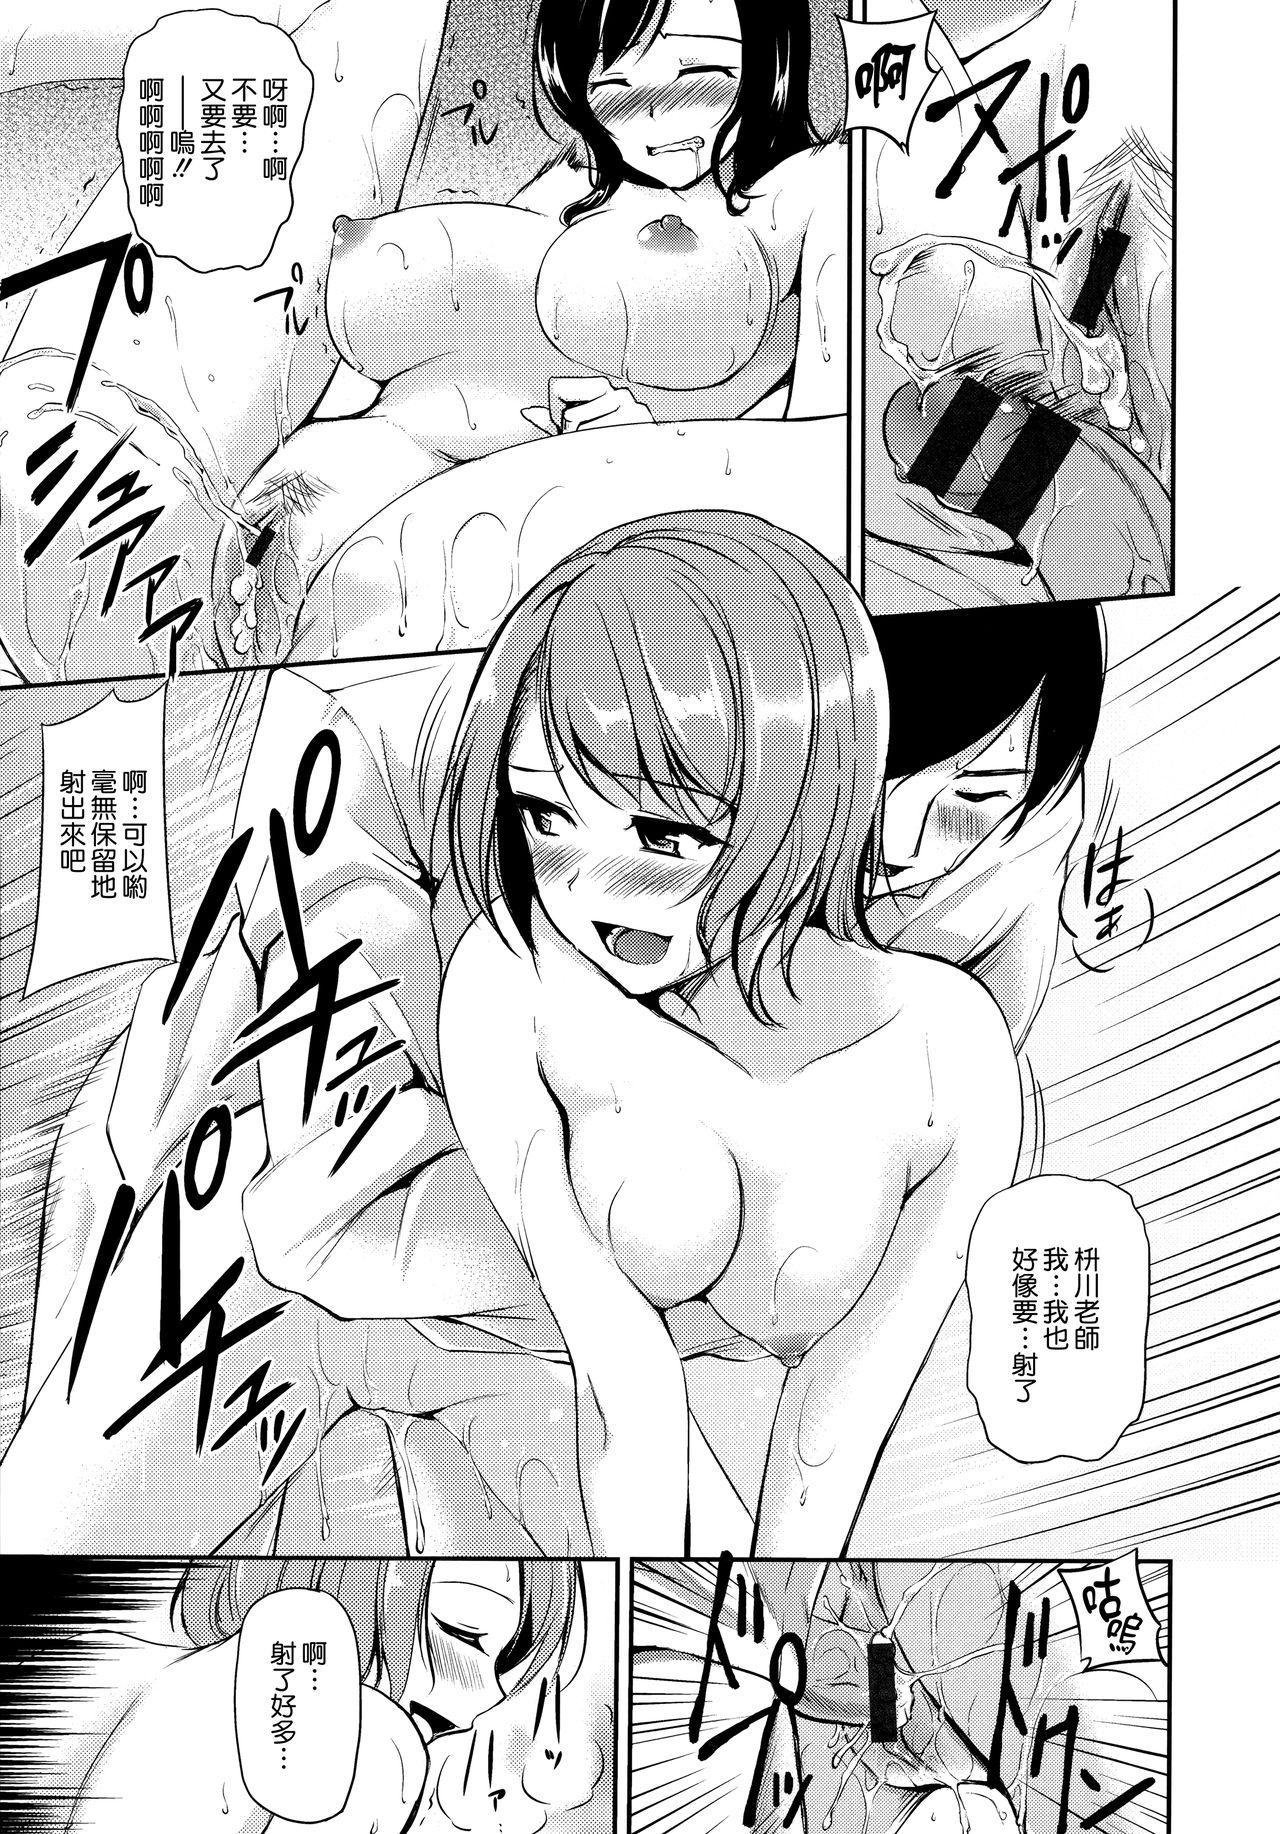 Kimagure Hanabira + Toranoana Leaflet 27